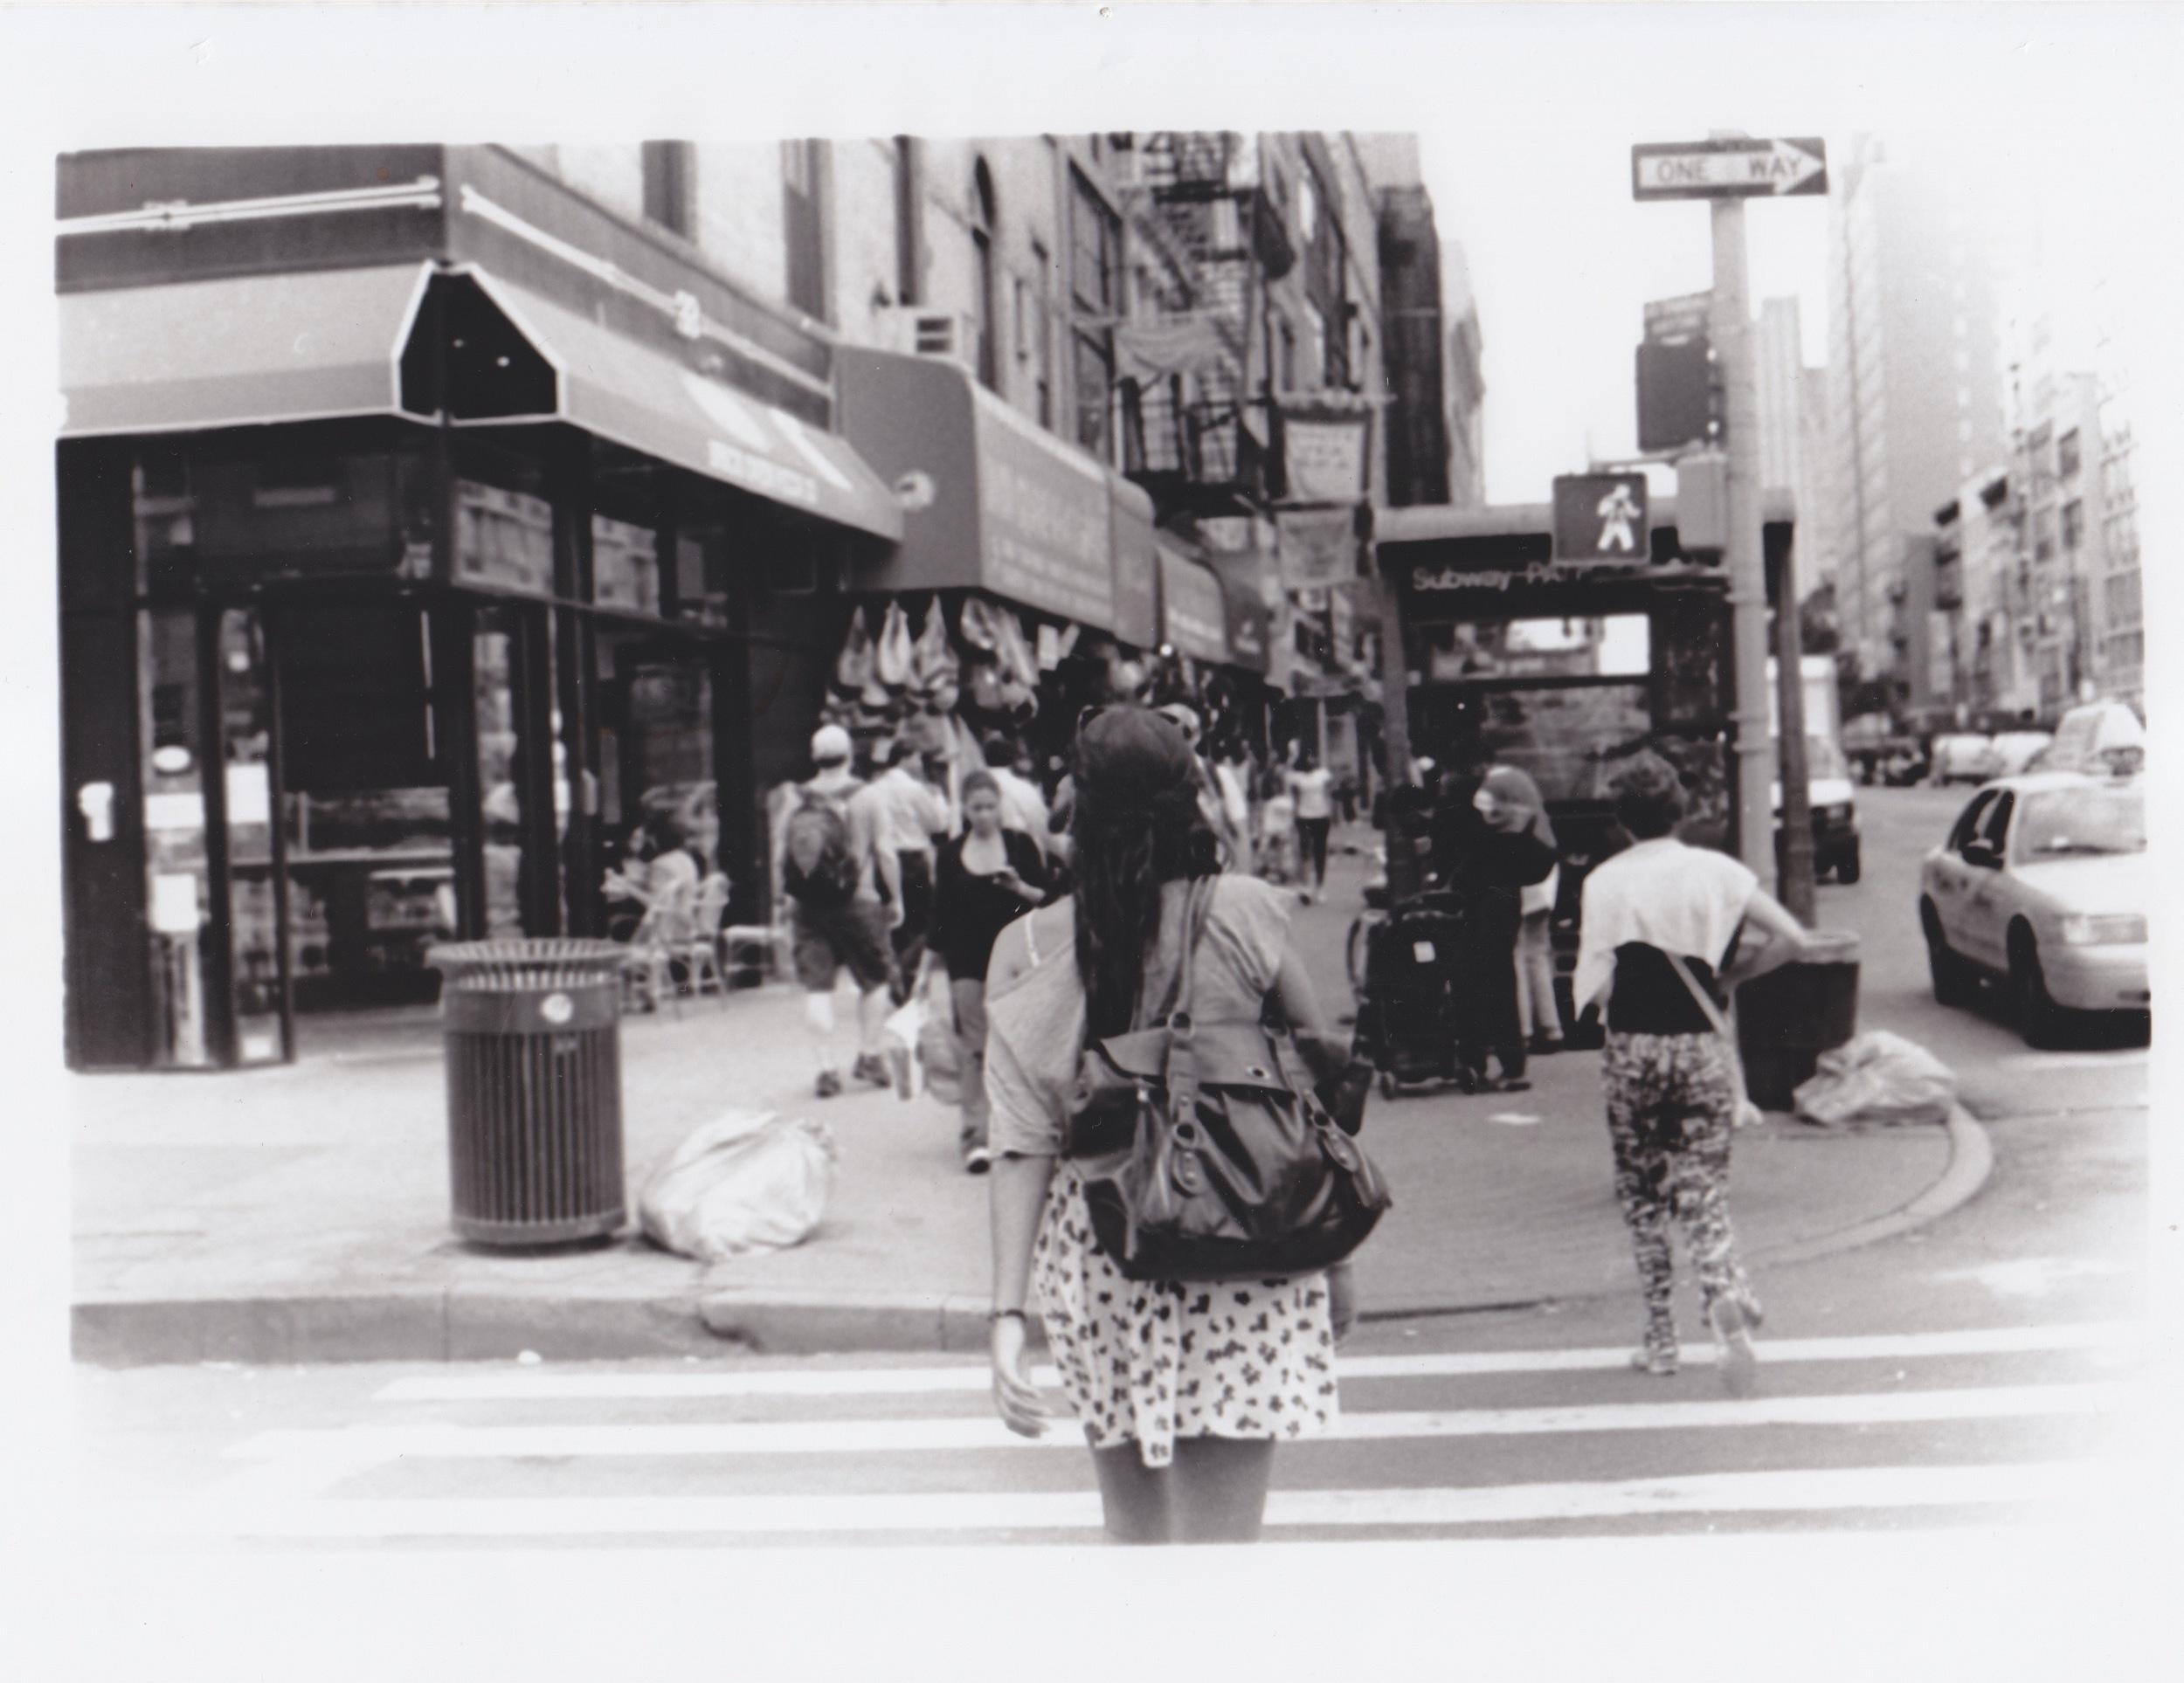 14thStreetUnionSquare.jpg